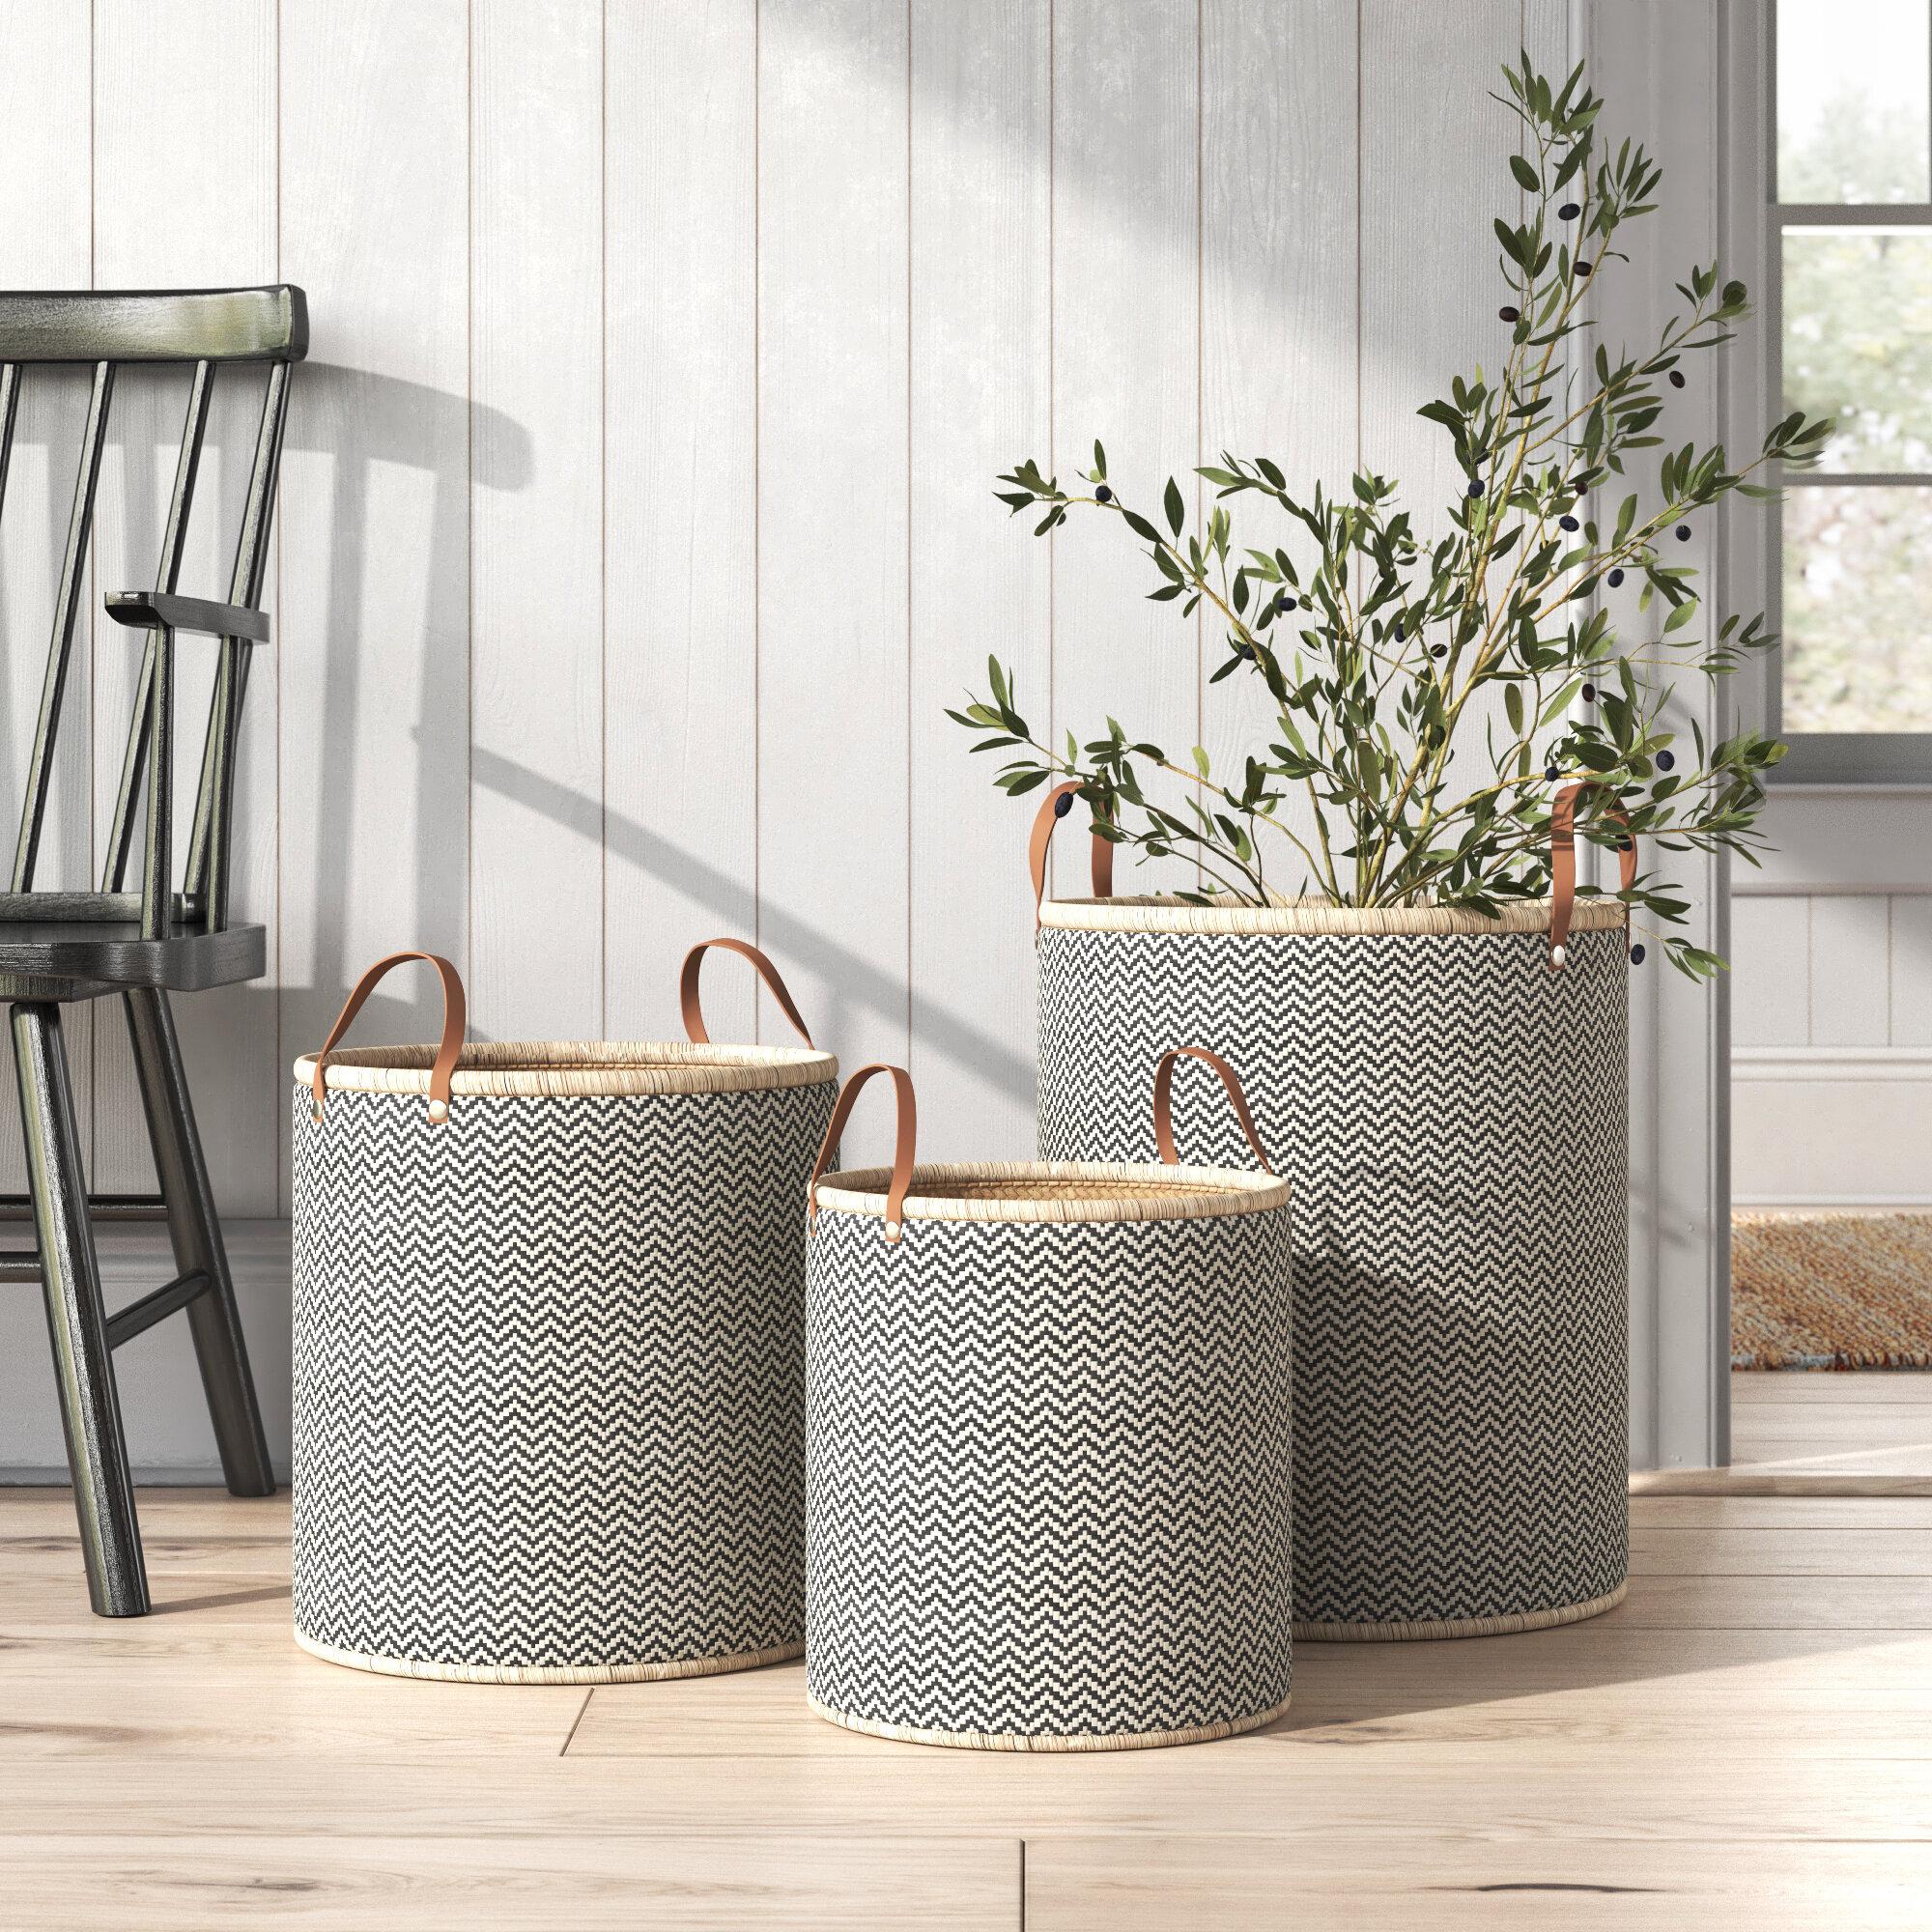 Laundry Palm Leaf 3 Piece Wicker Basket Set Reviews Birch Lane